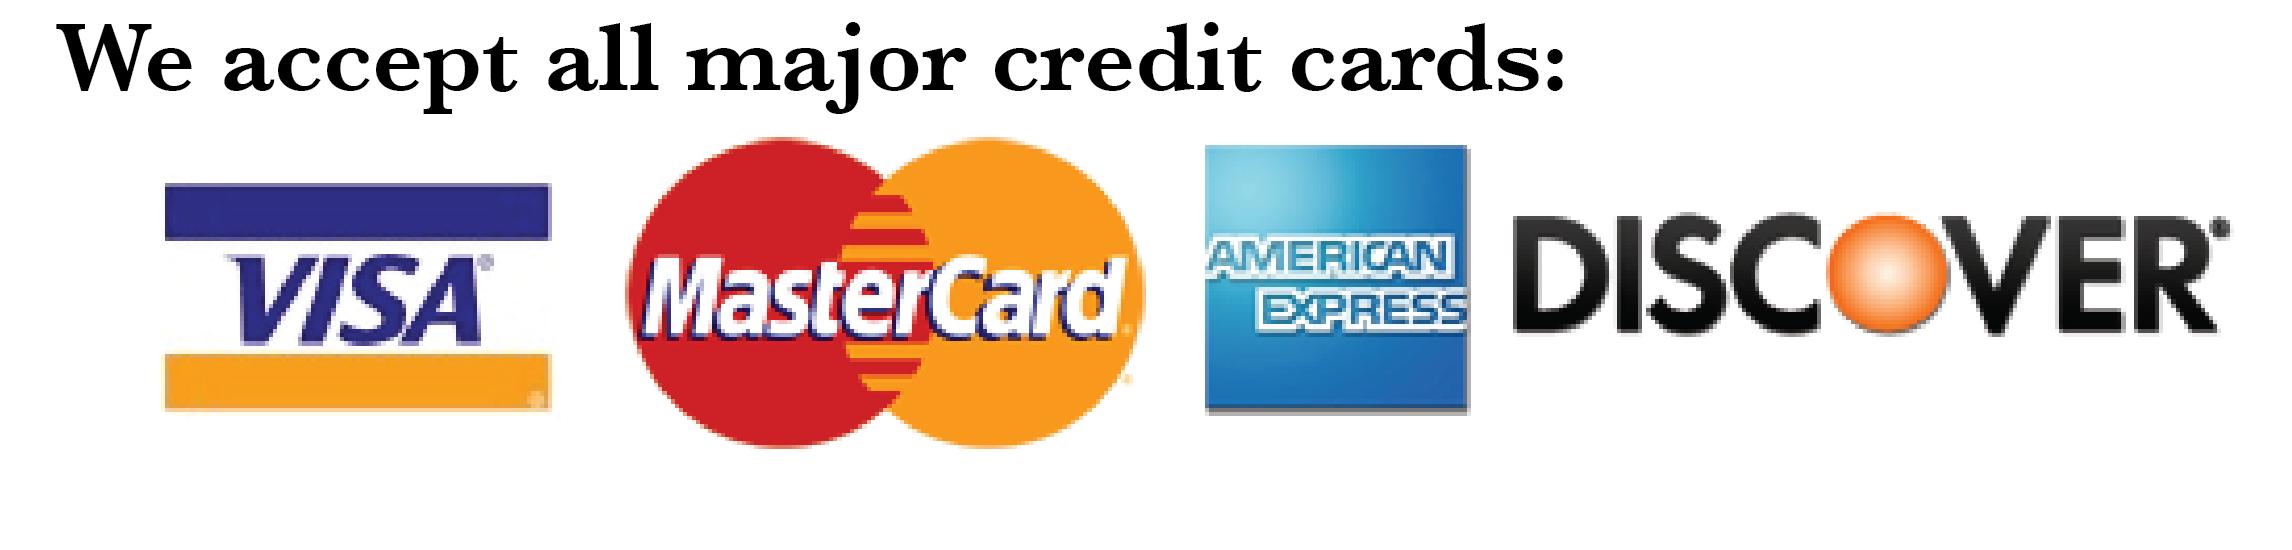 majorcreditcards